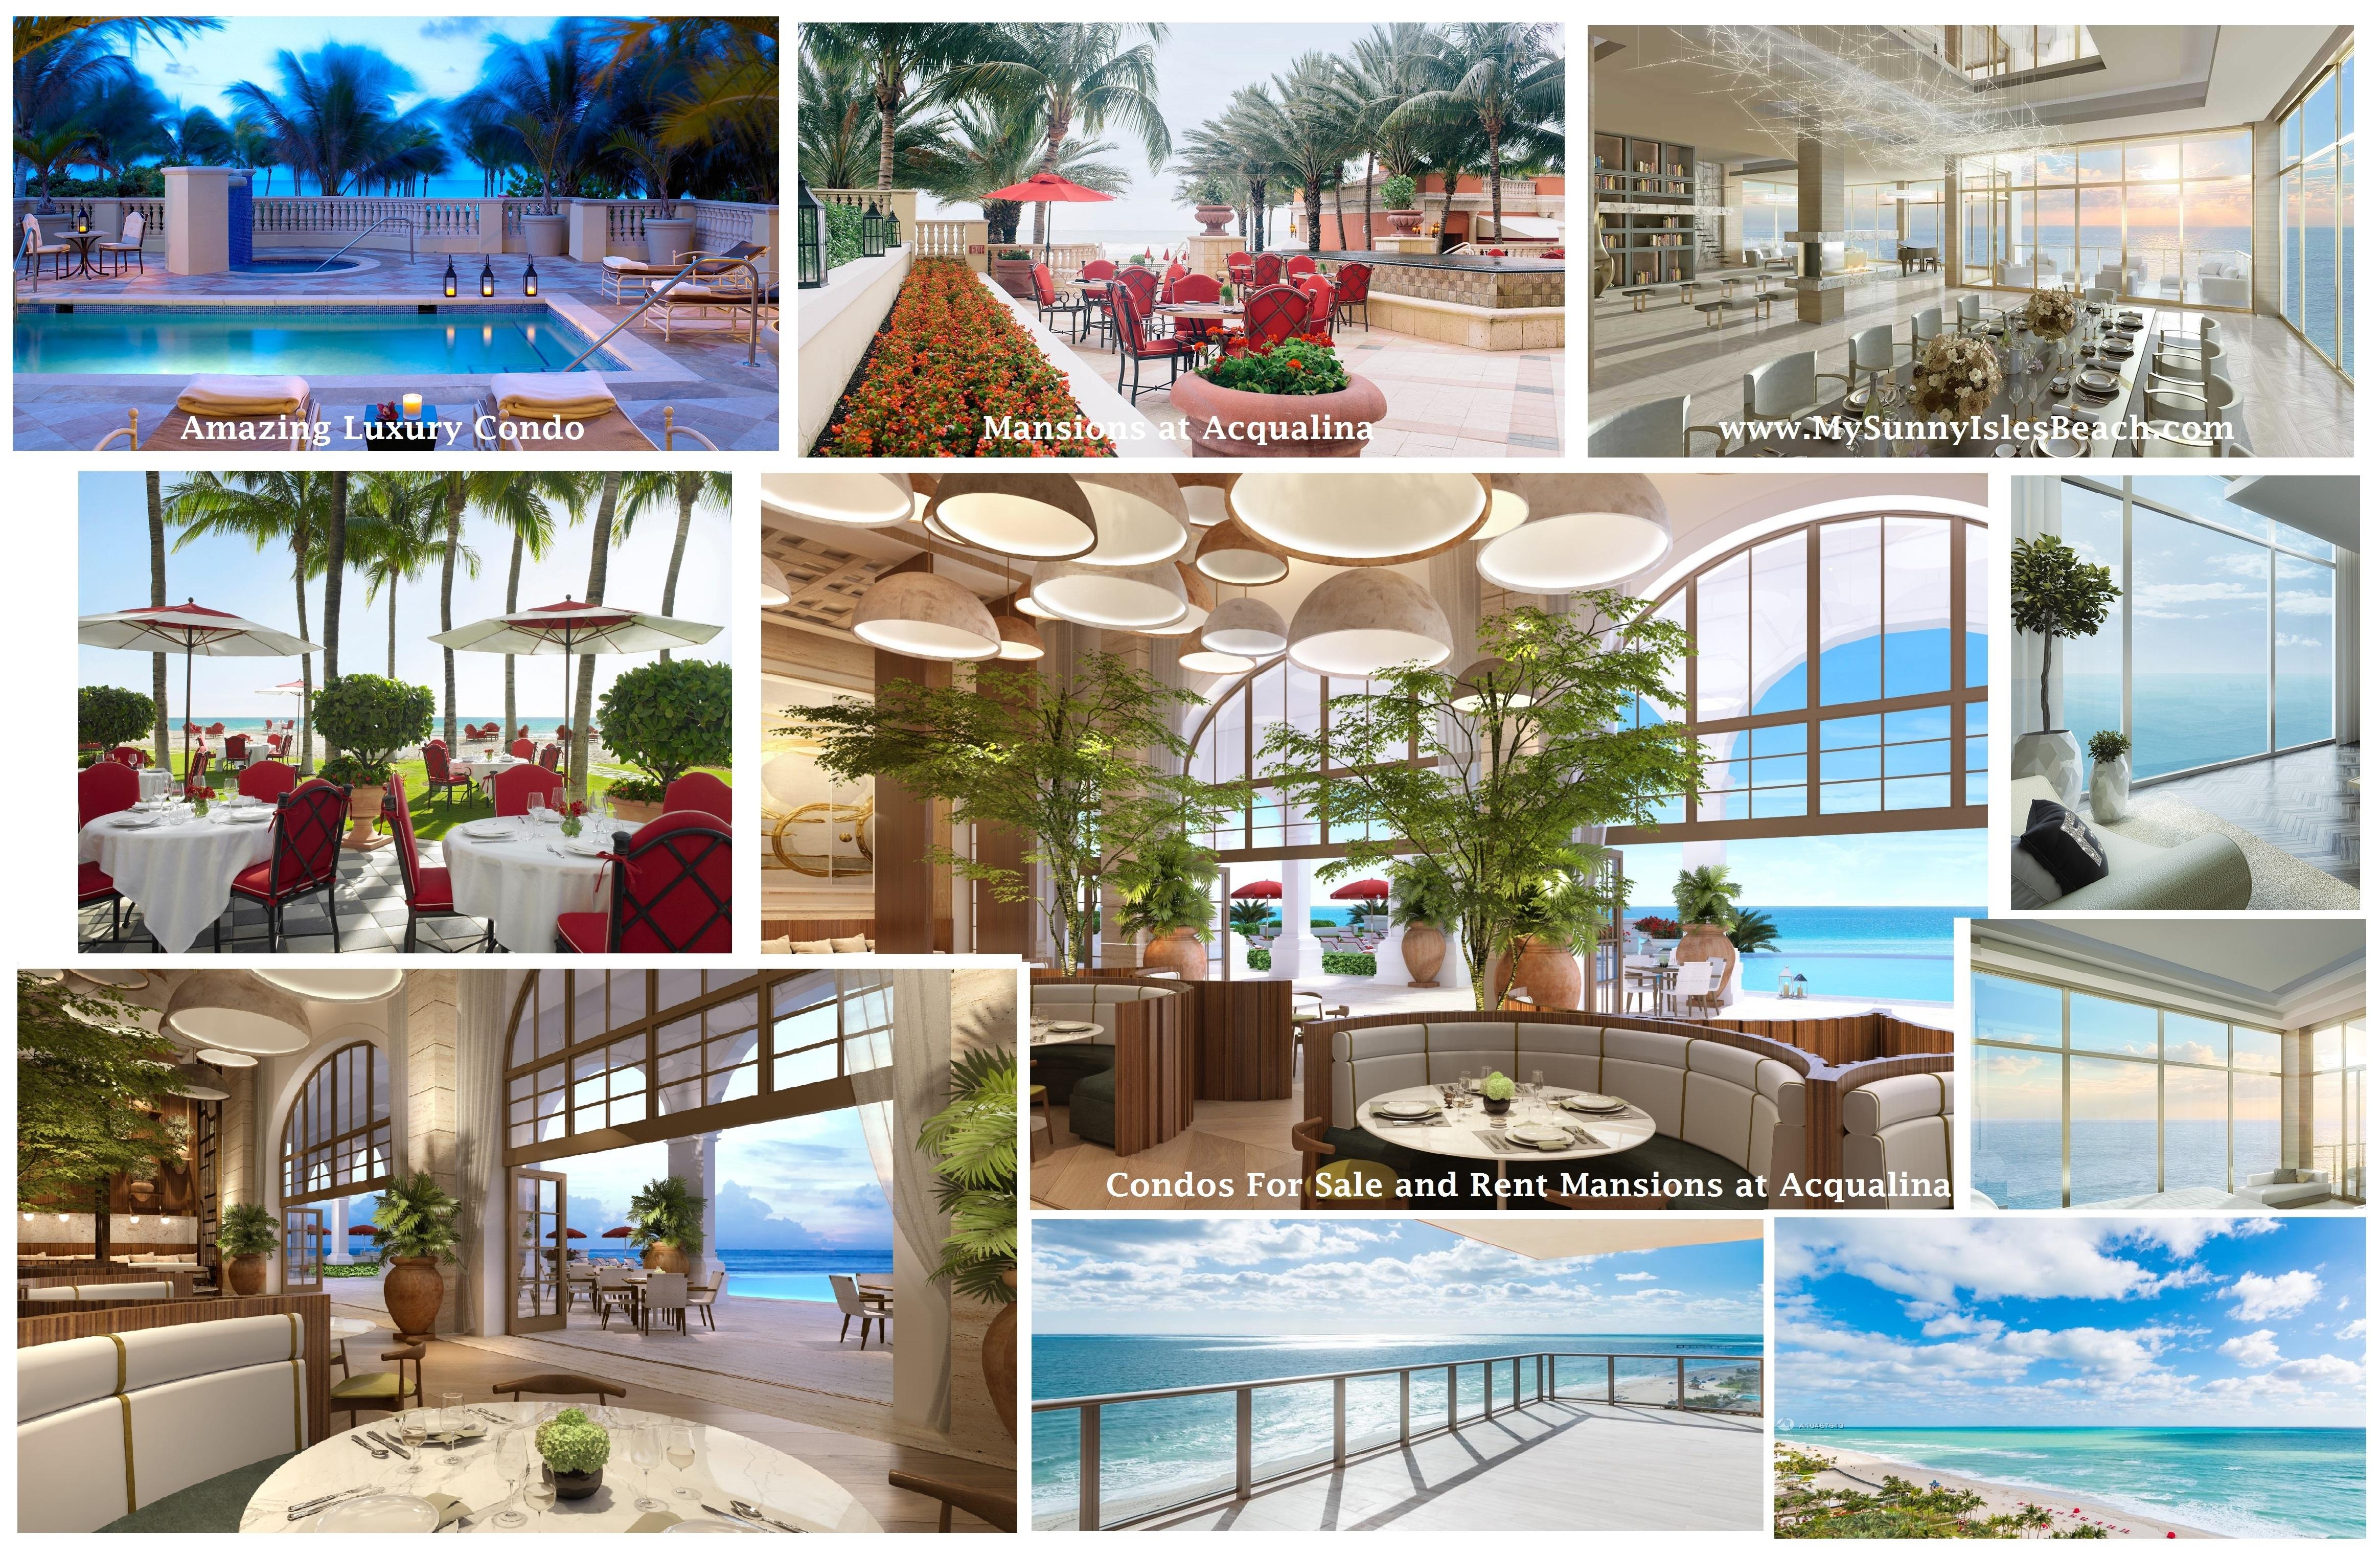 Buy, Rent, Sell Condo Mansions at Acqualina With Valeria Mola Realtor